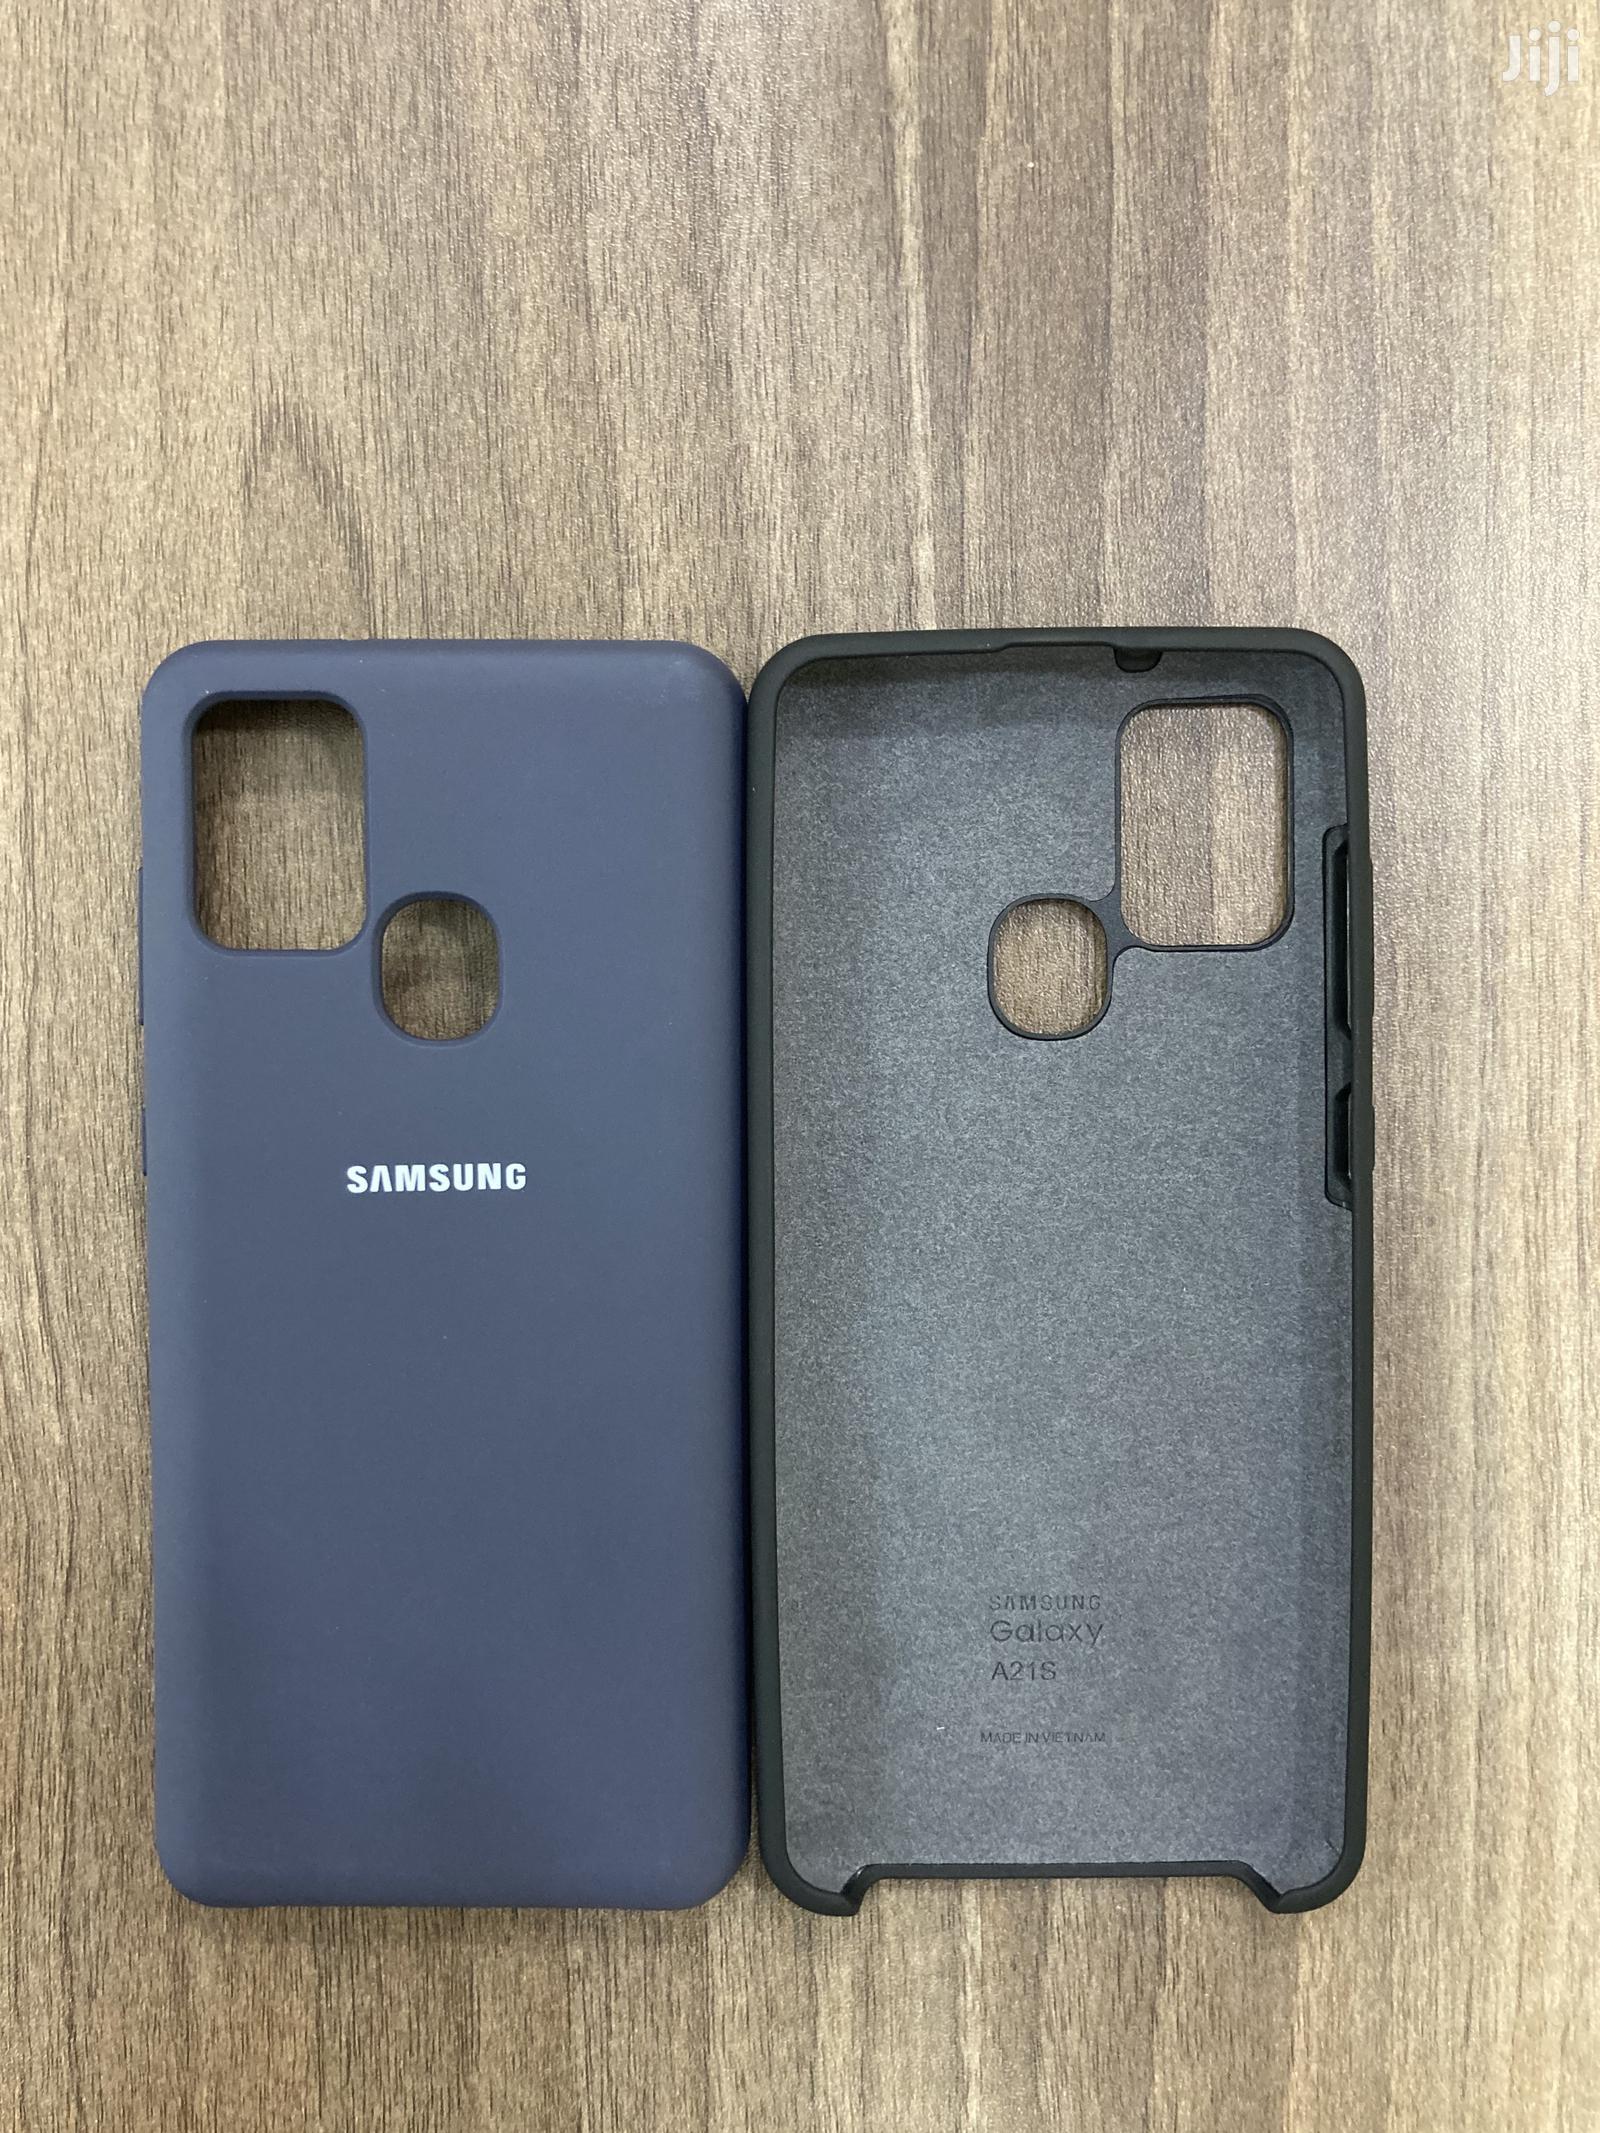 Samsung Galaxy A21s Silicone Cases